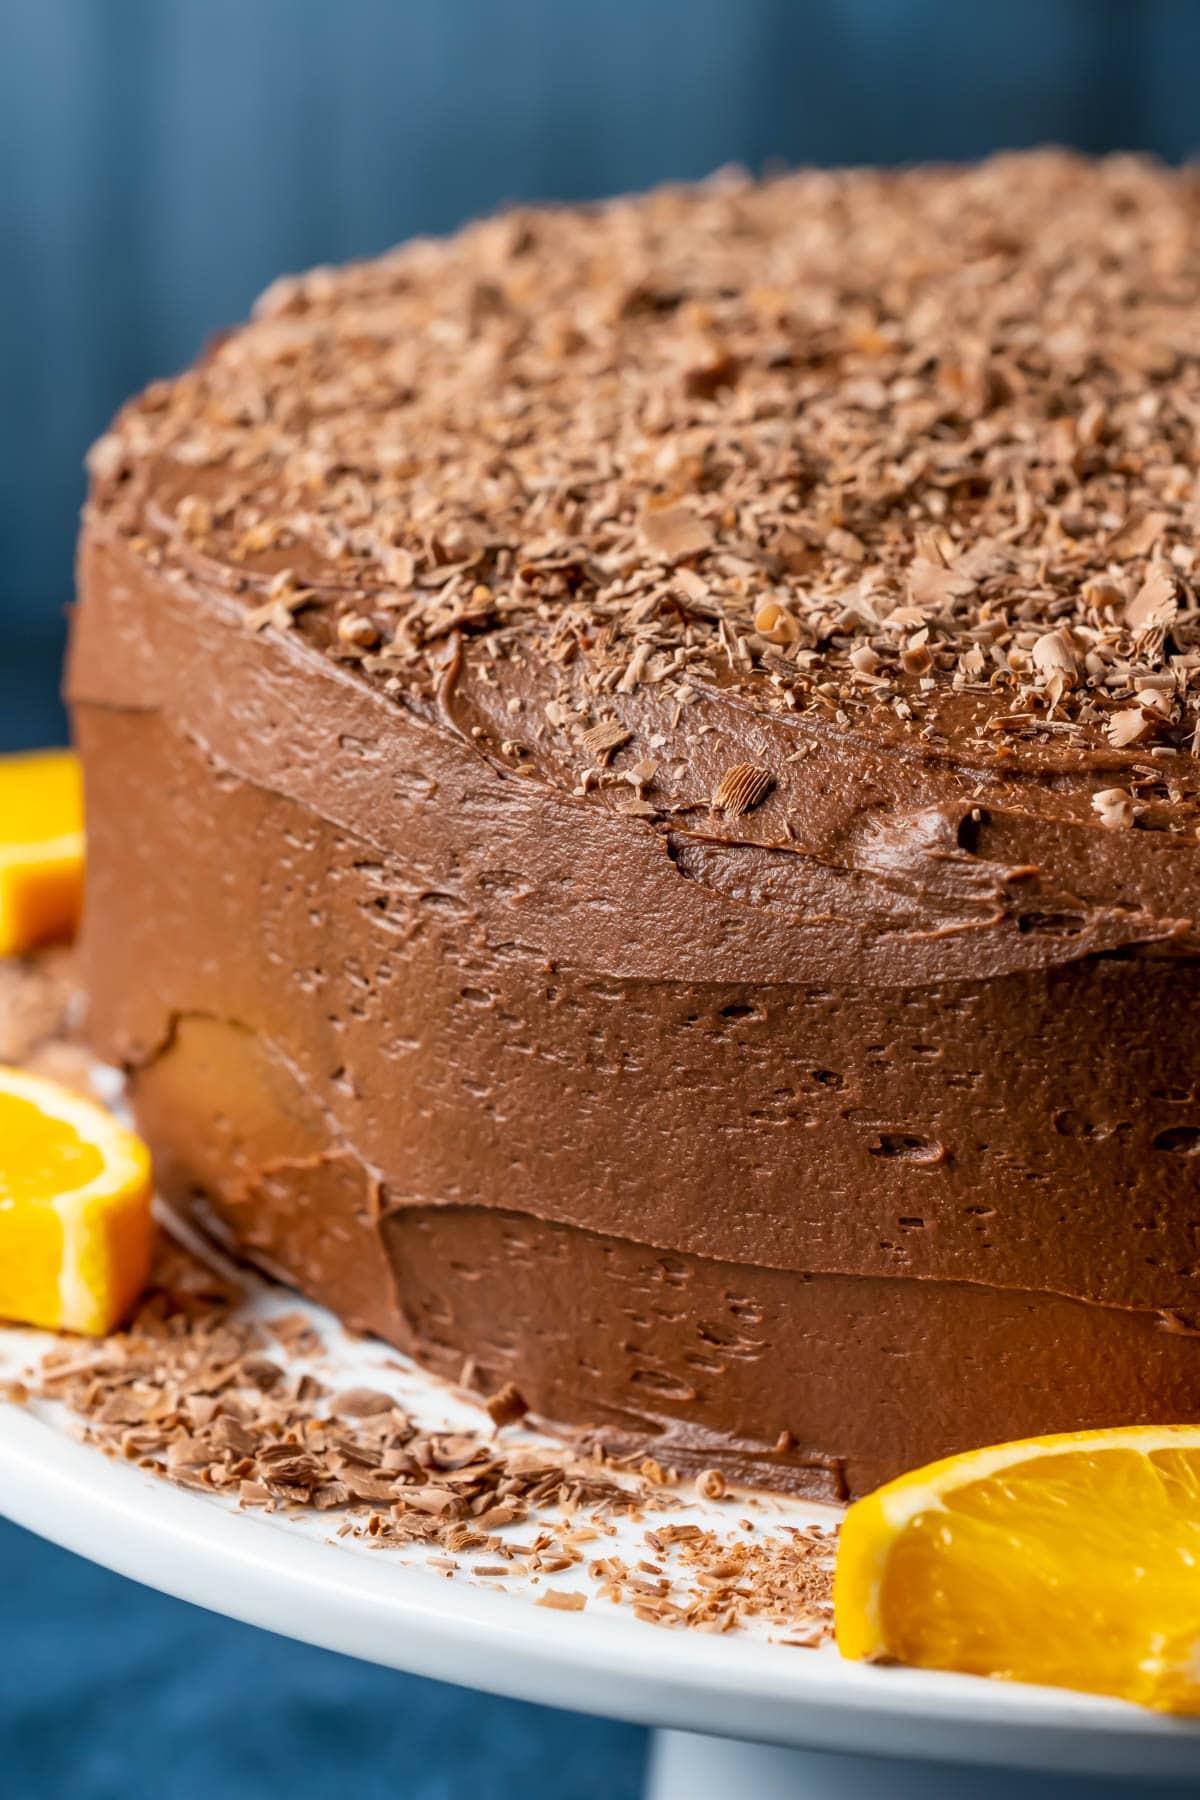 Chocolate orange cake on a white cake stand with orange slices.